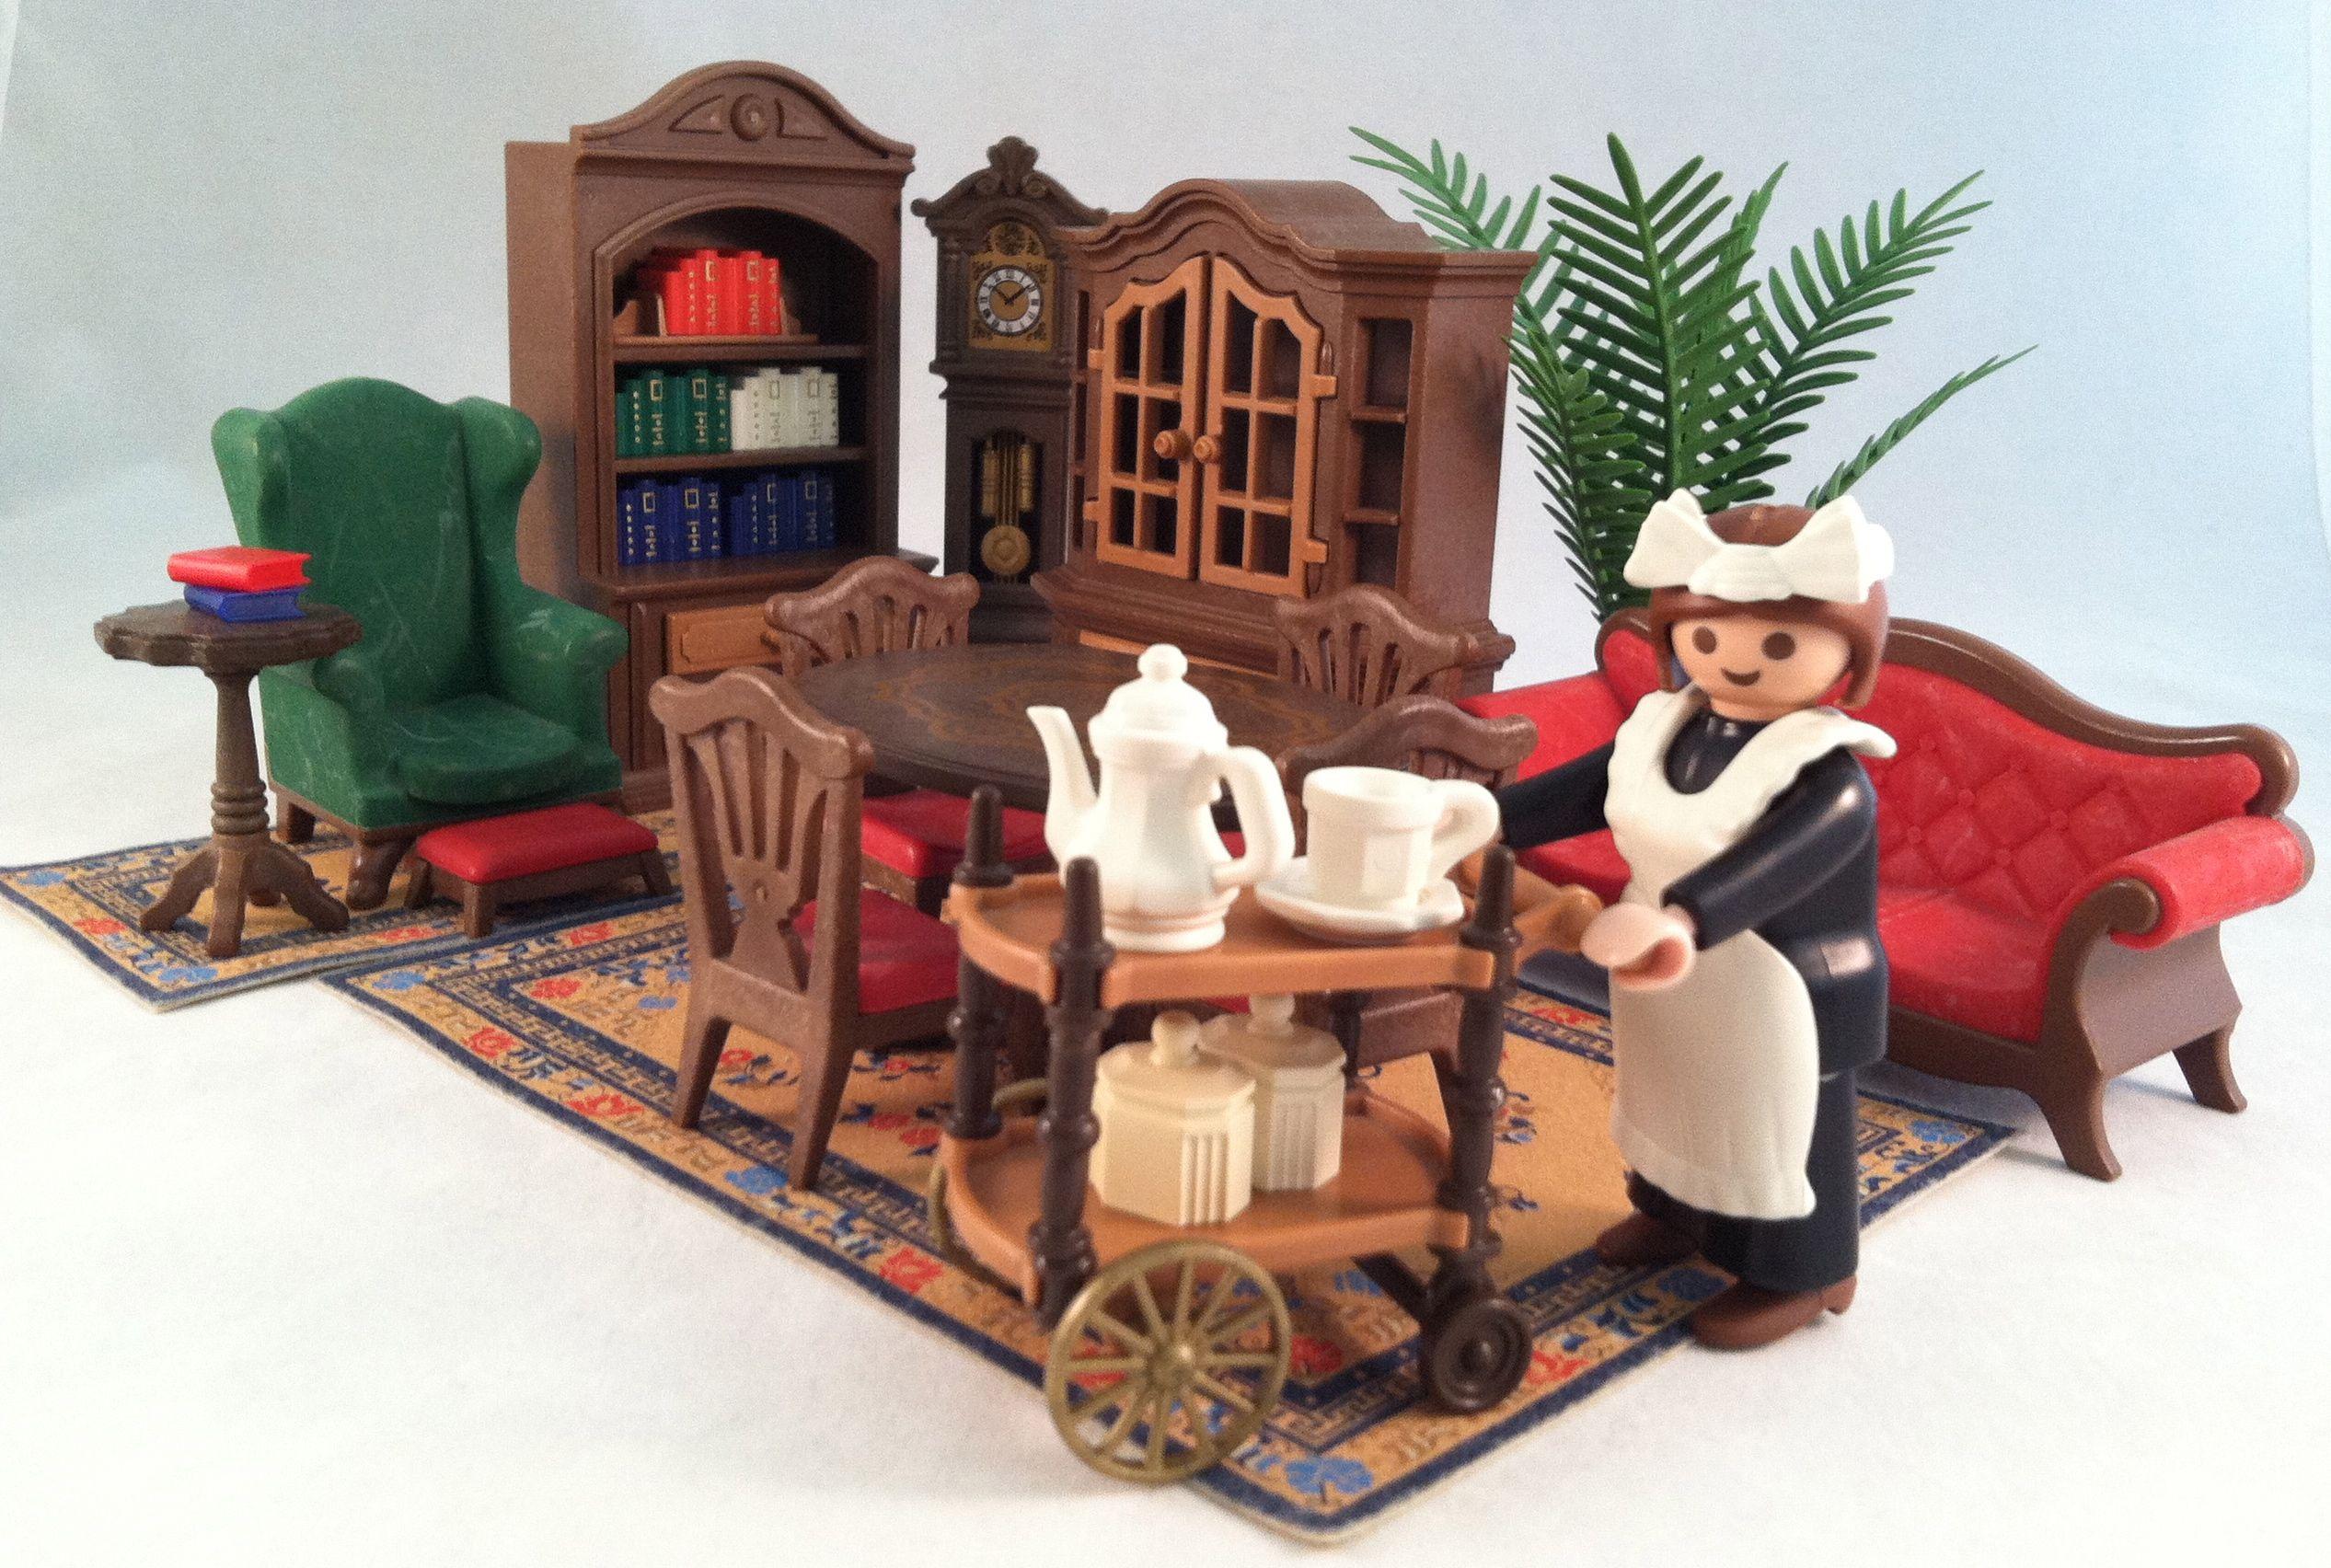 Woonkamer playmobil   Nostalgie   Pinterest   Mansion, Victorian and ...